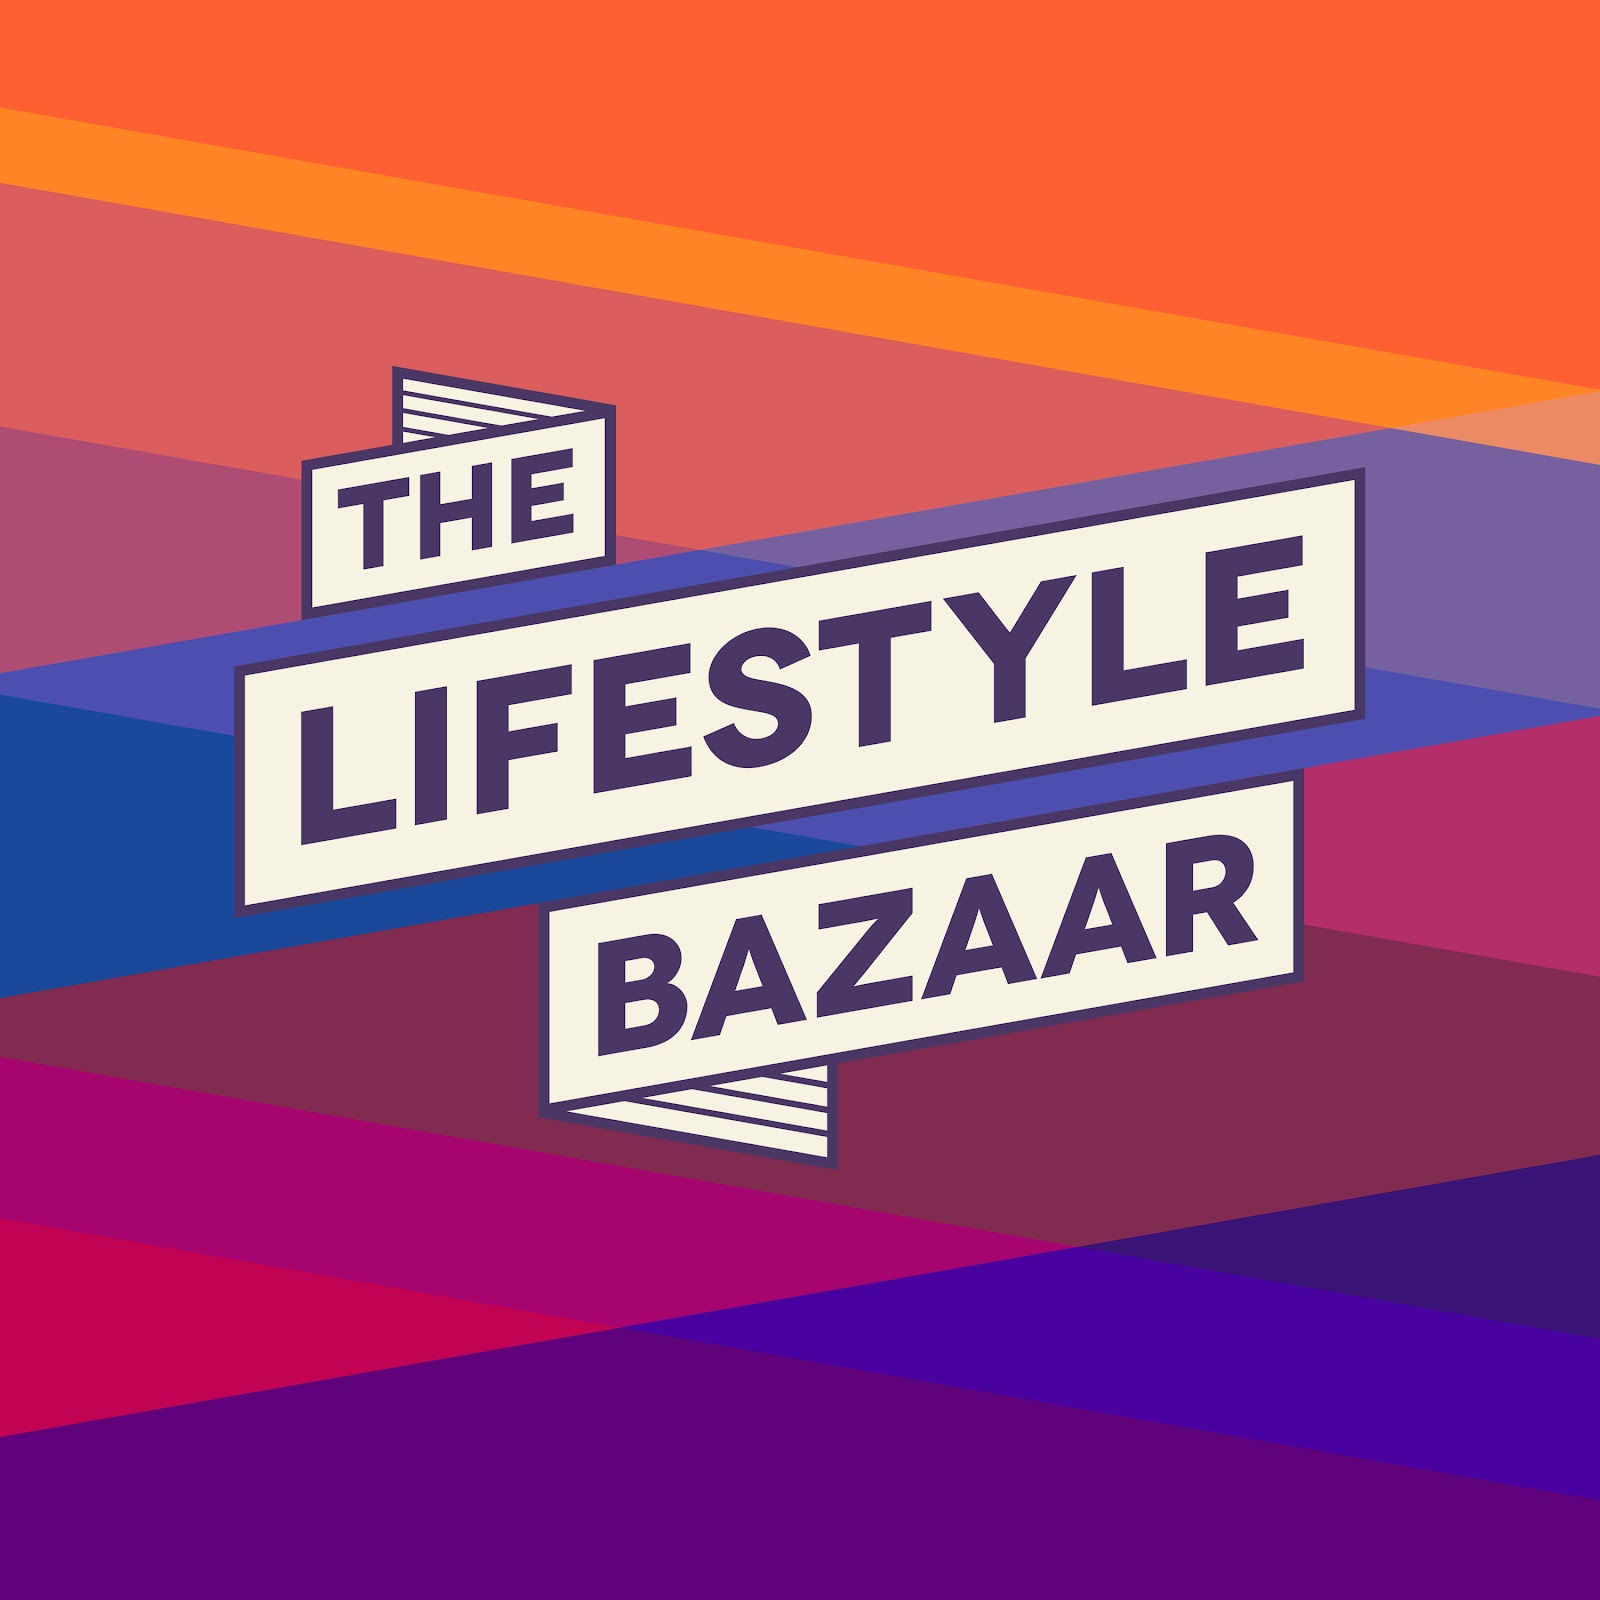 The Lifestyle Bazaar